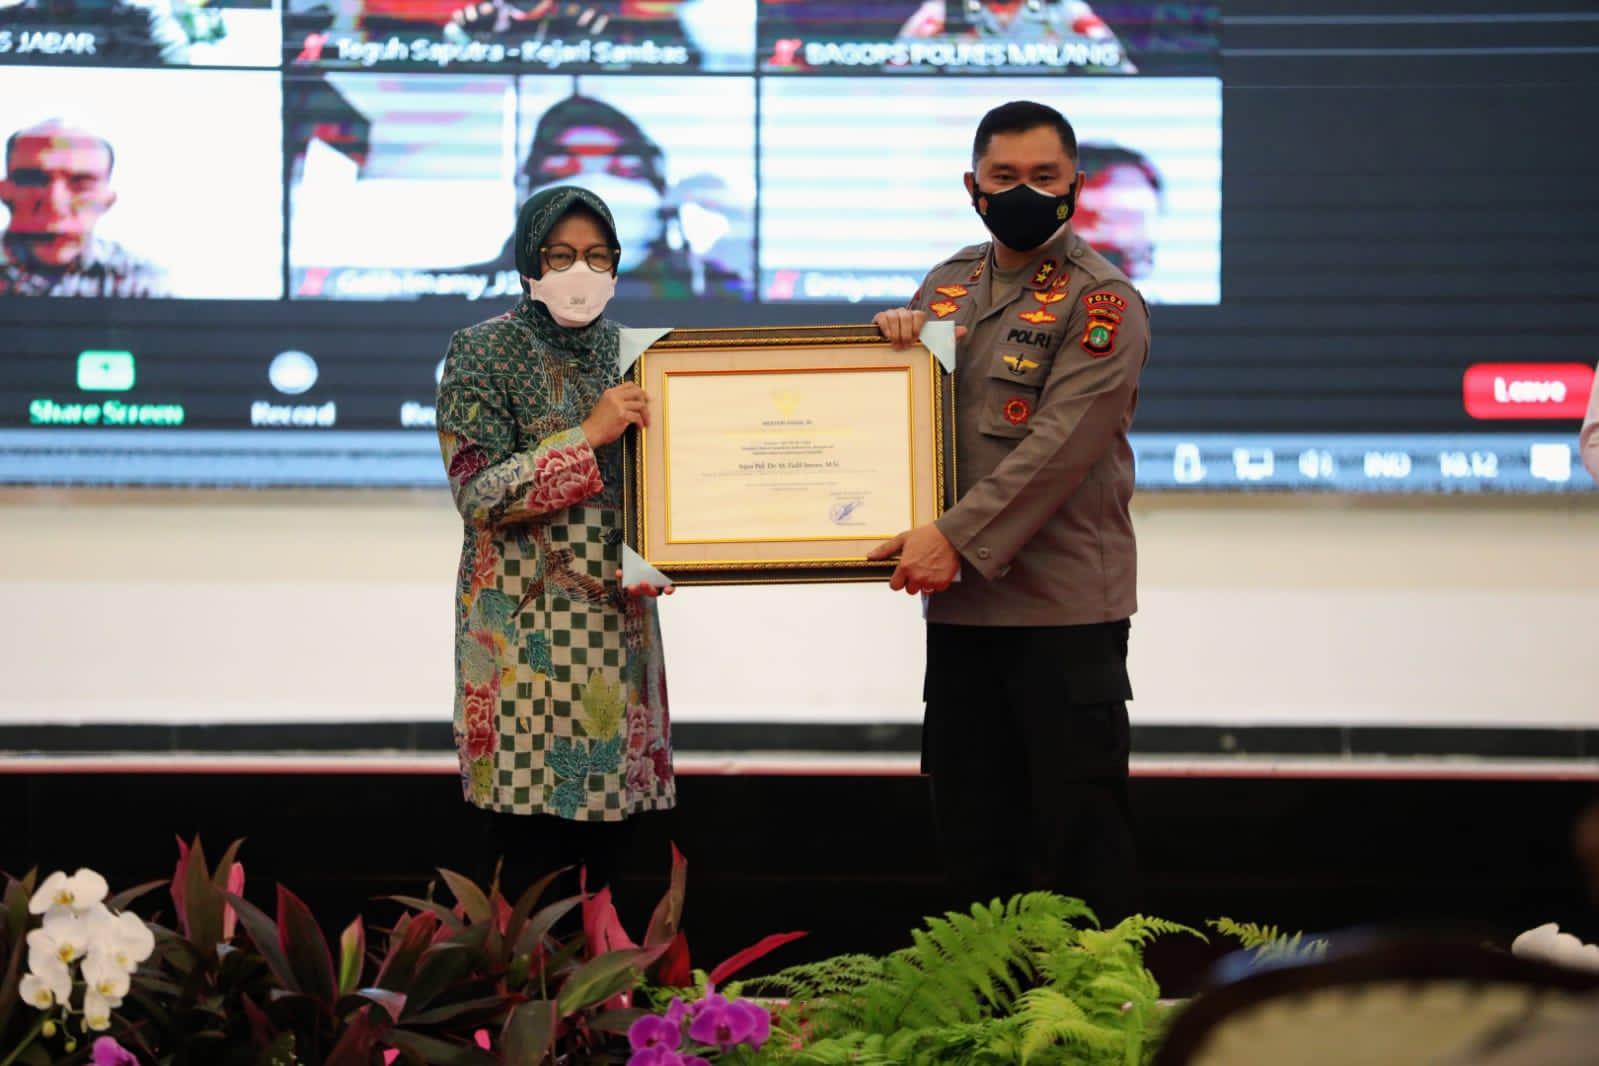 Berpartisipasi Aktif Kawal Bansos, Mensos Risma Berikan Penghargaan Bagi Aparat 143 Penegak Hukum